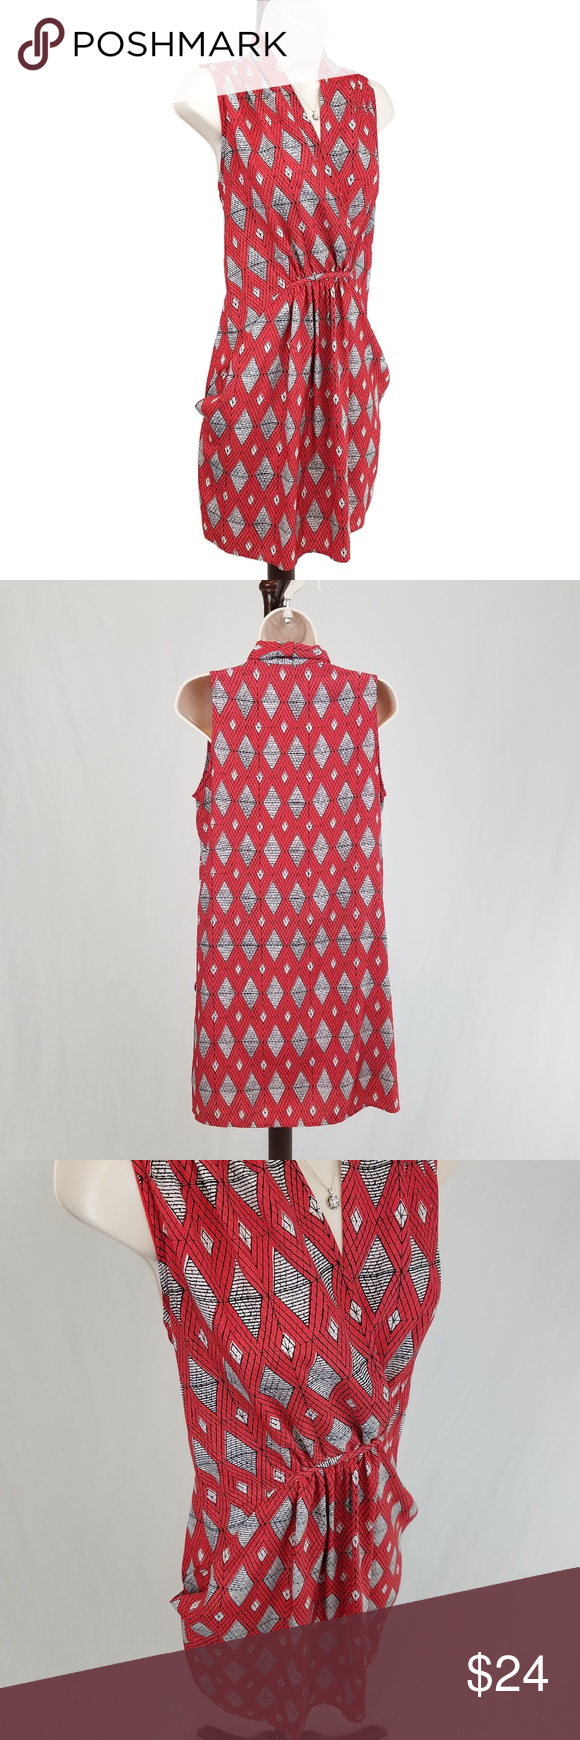 Collective concepts diamond print dress in my posh picks